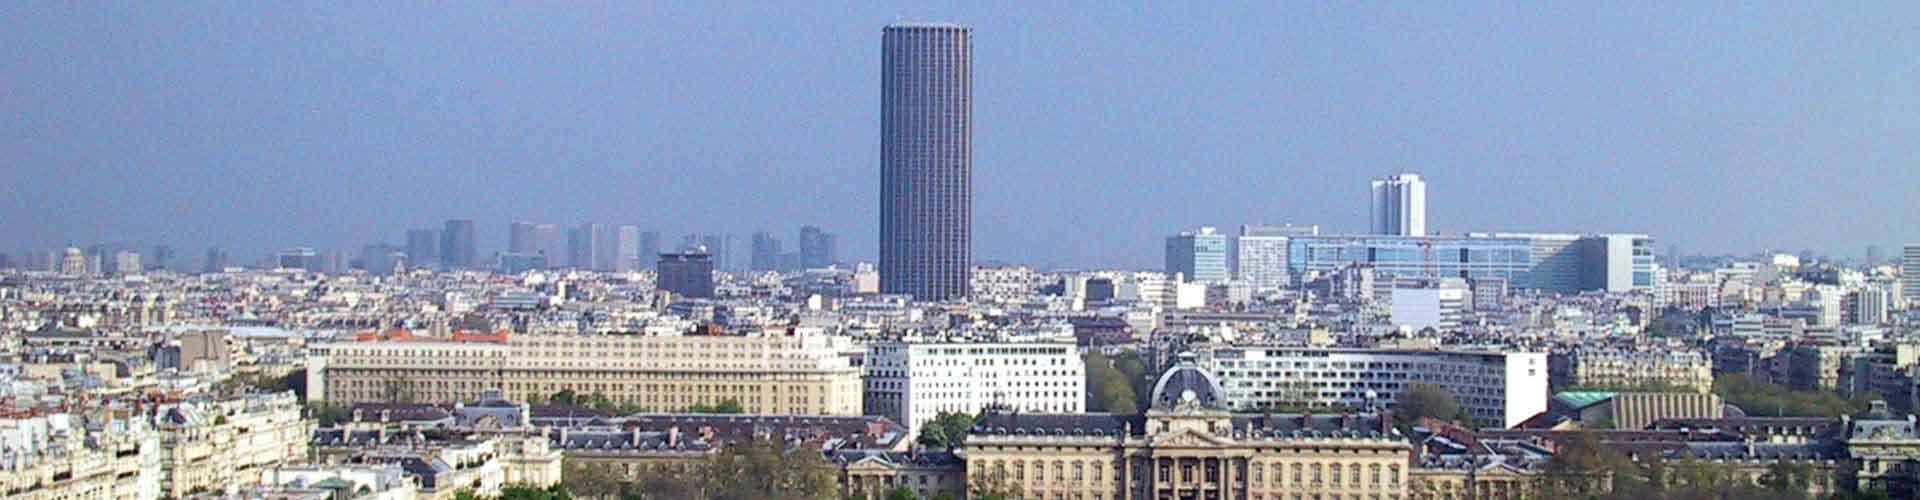 París - Apartamentos cerca a Tour Montparnasse. Mapas de París, Fotos y comentarios de cada Apartamento en París.